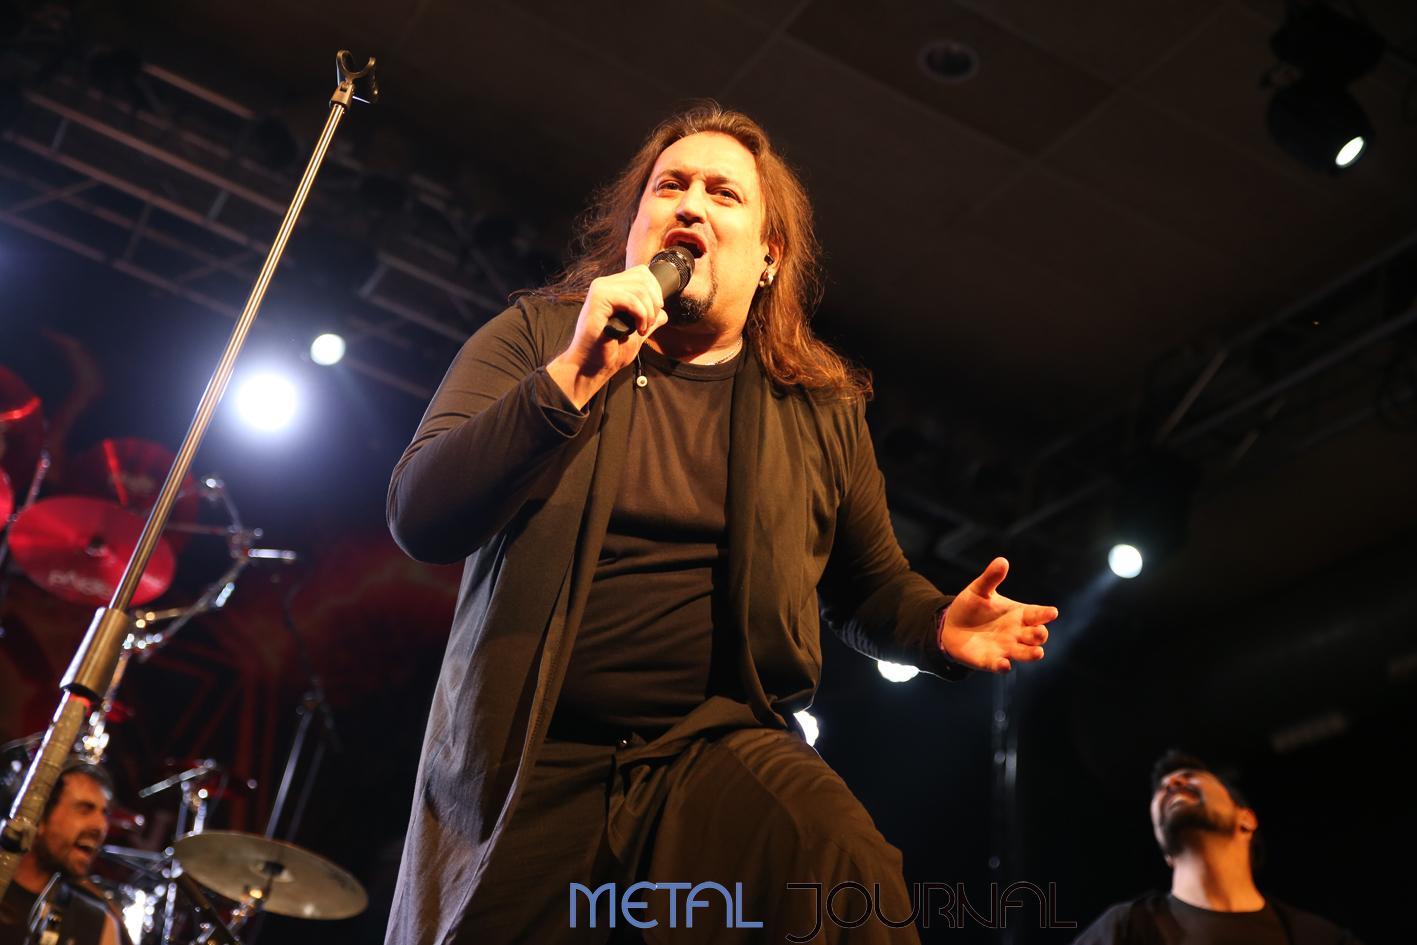 nocturnia bilbao 2019 metal journal pic 2